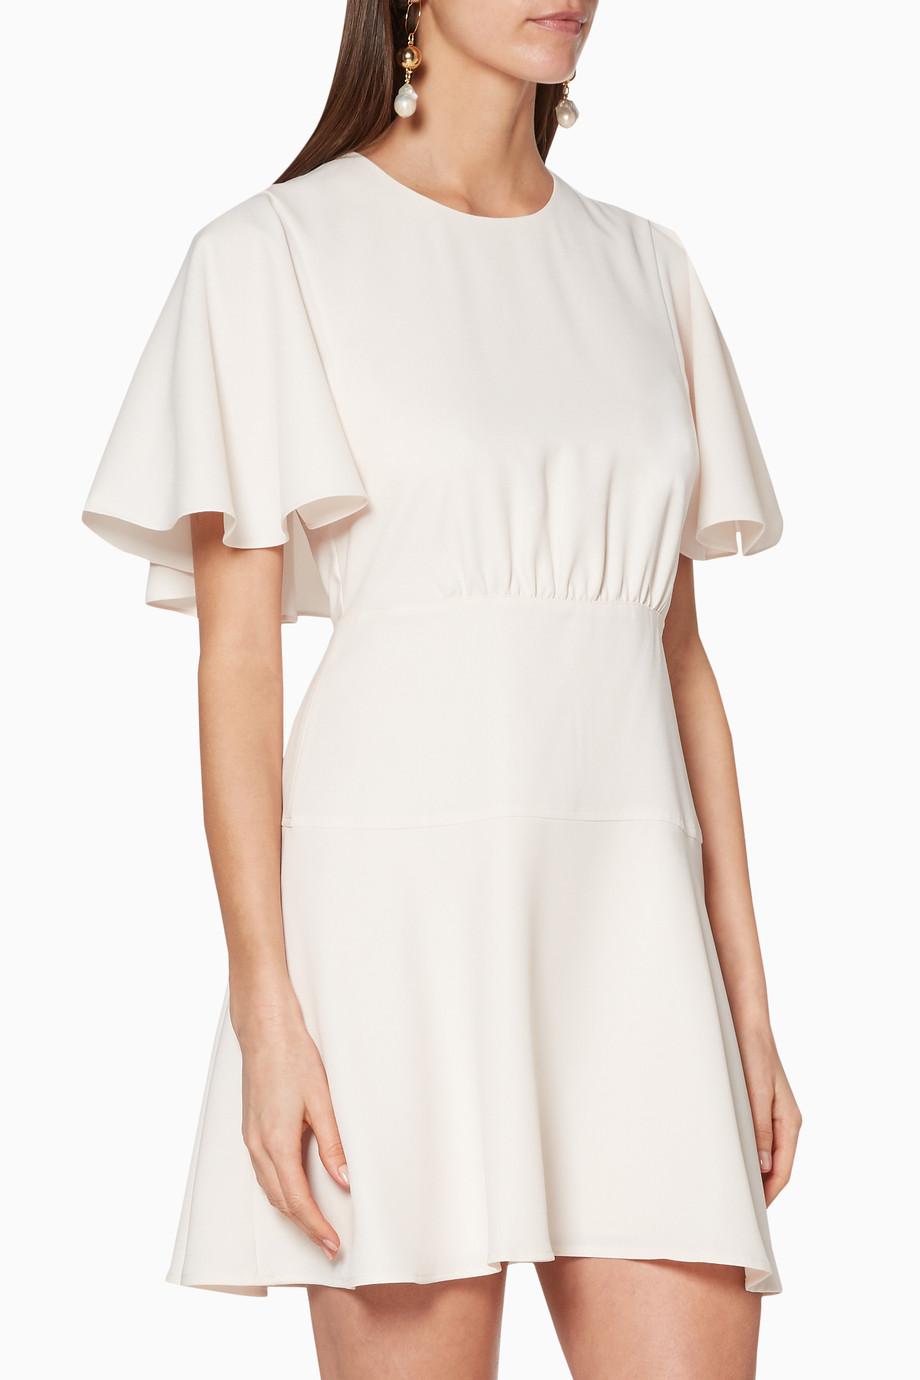 bcb15ed5d3 Shop Club Monaco White White Ceithan Dress for Women | Ounass